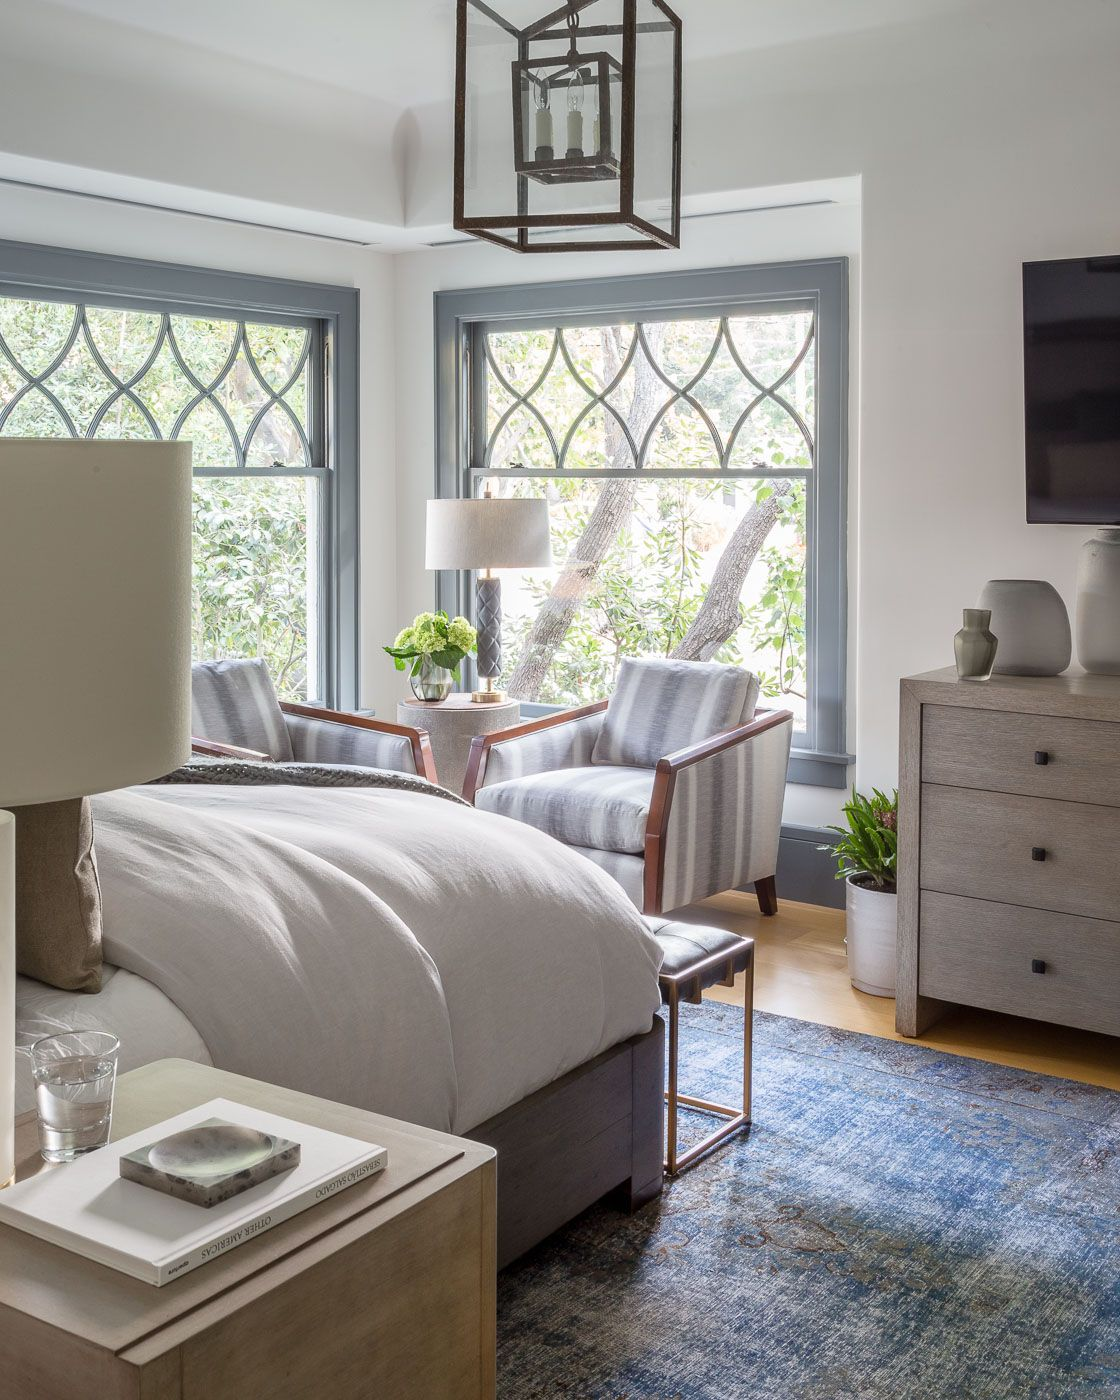 15 Top Raised Ranch Interior Design Ideas To Steal: House Interior, Home Decor